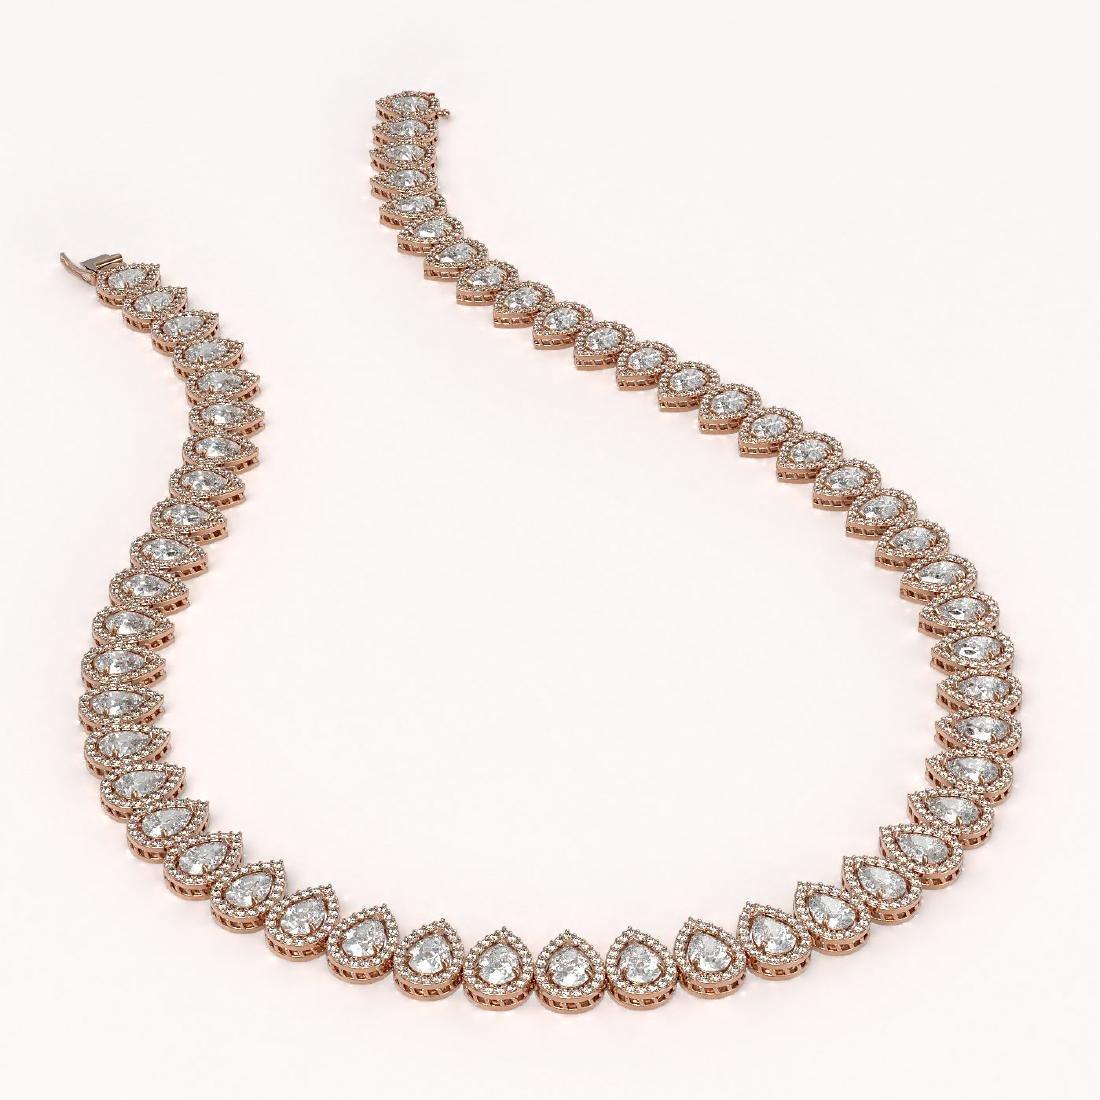 42.11 CTW Pear Diamond Designer Necklace 18K Rose Gold - 2